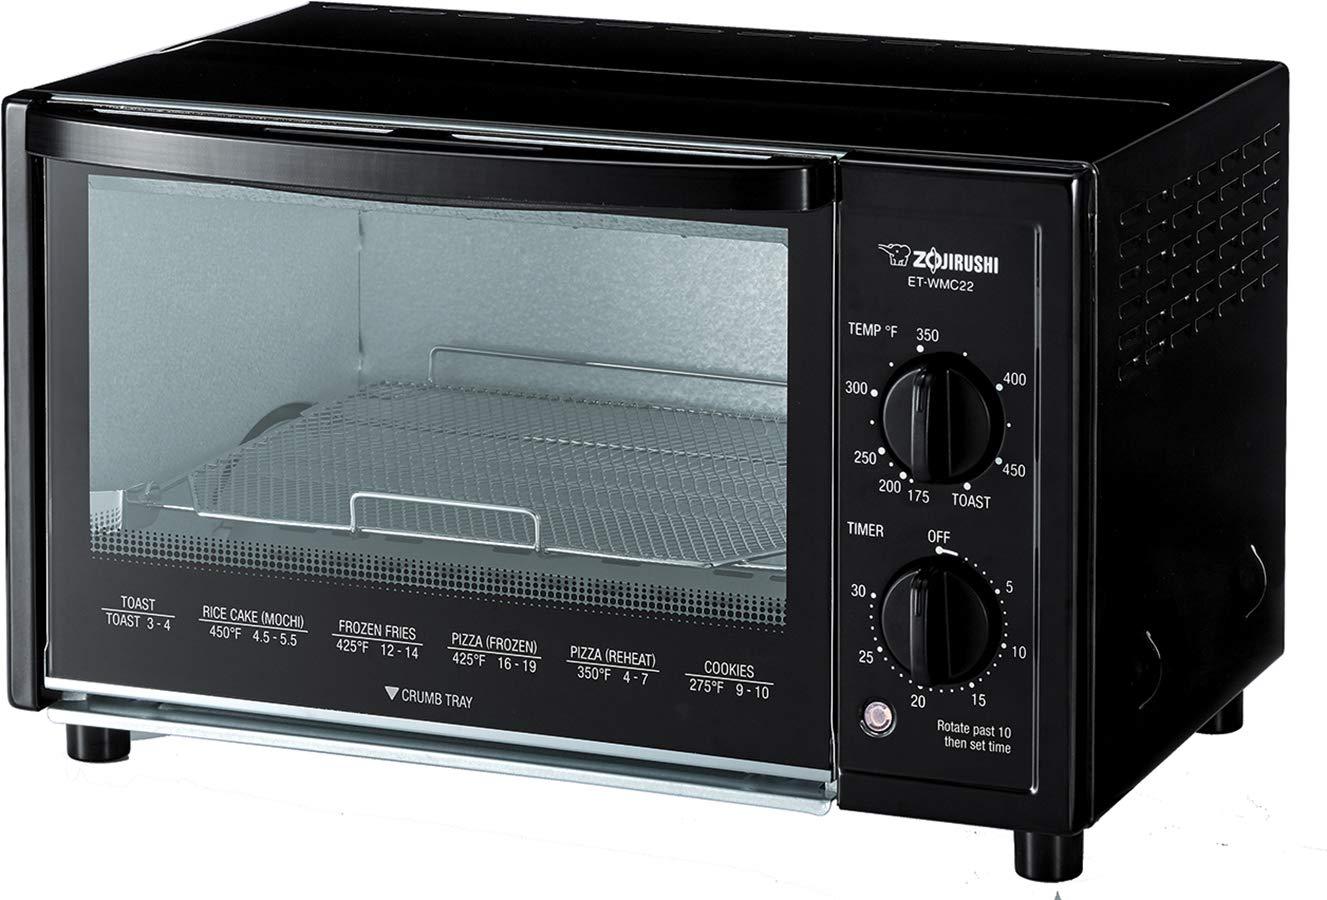 Zojirushi ET-WMC22 Toaster Oven, Black by Zojirushi